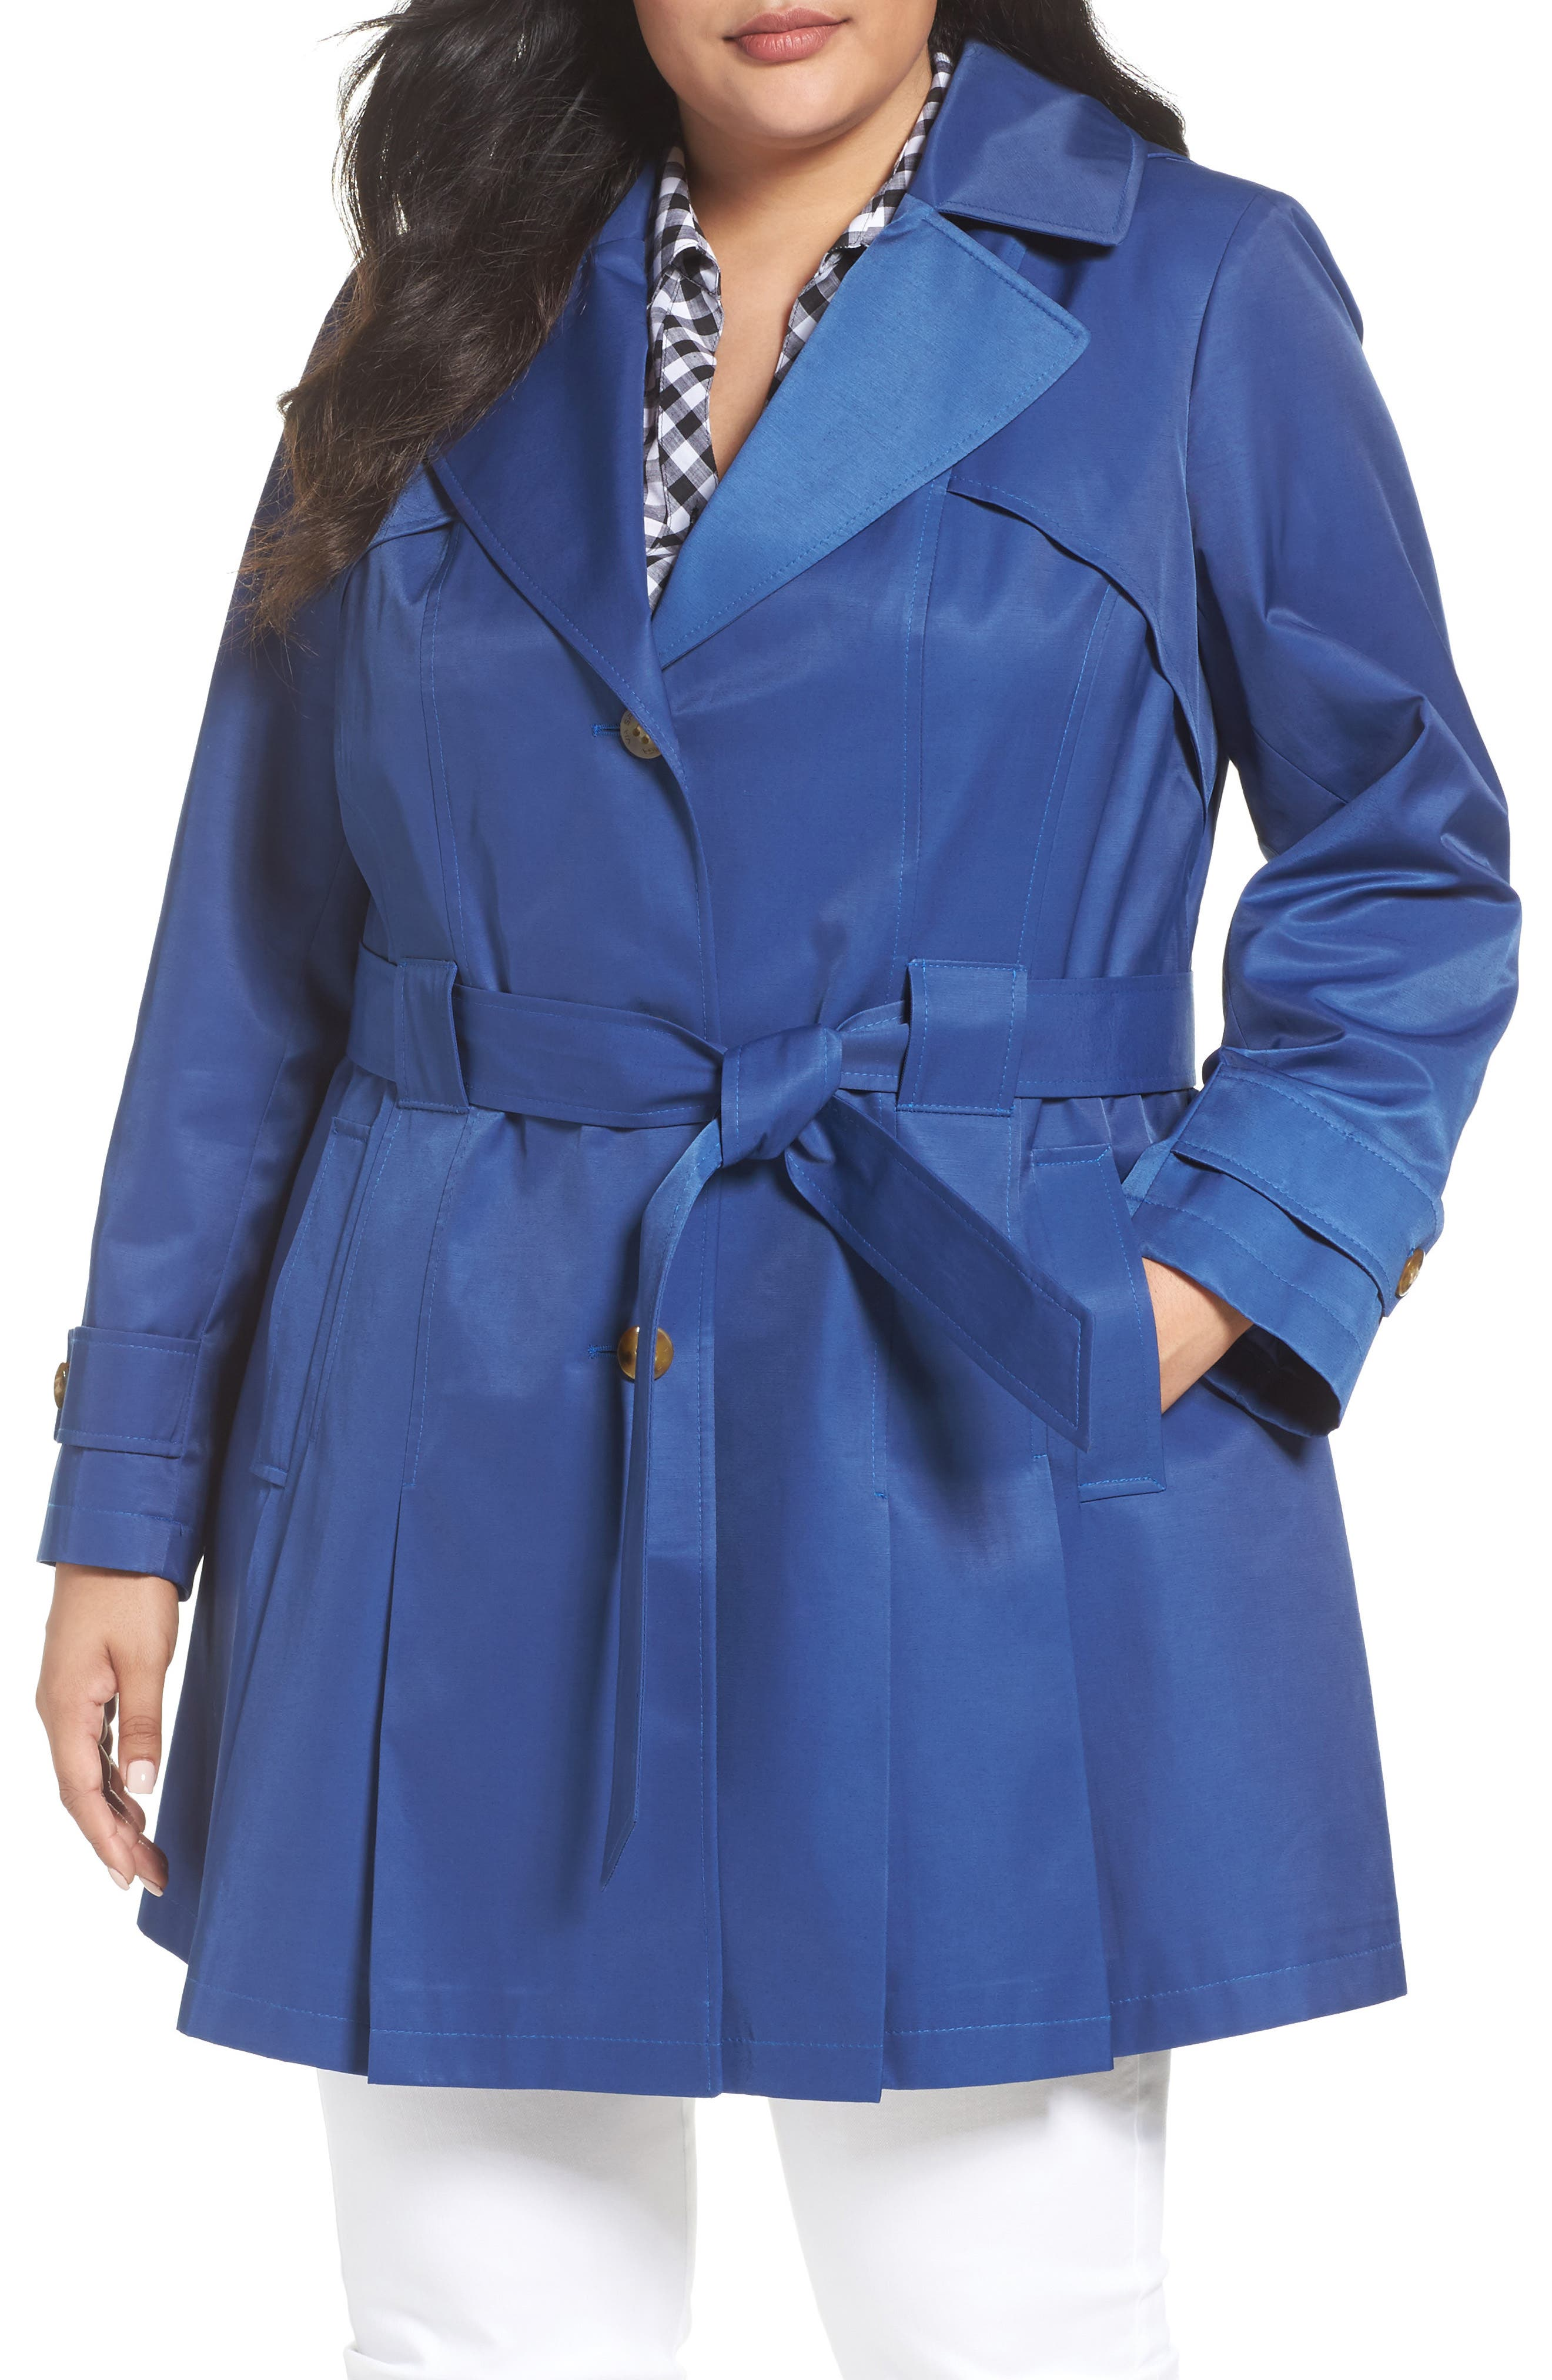 Via Spiga 'Scarpa' Single Breasted Trench Coat (Plus Size)